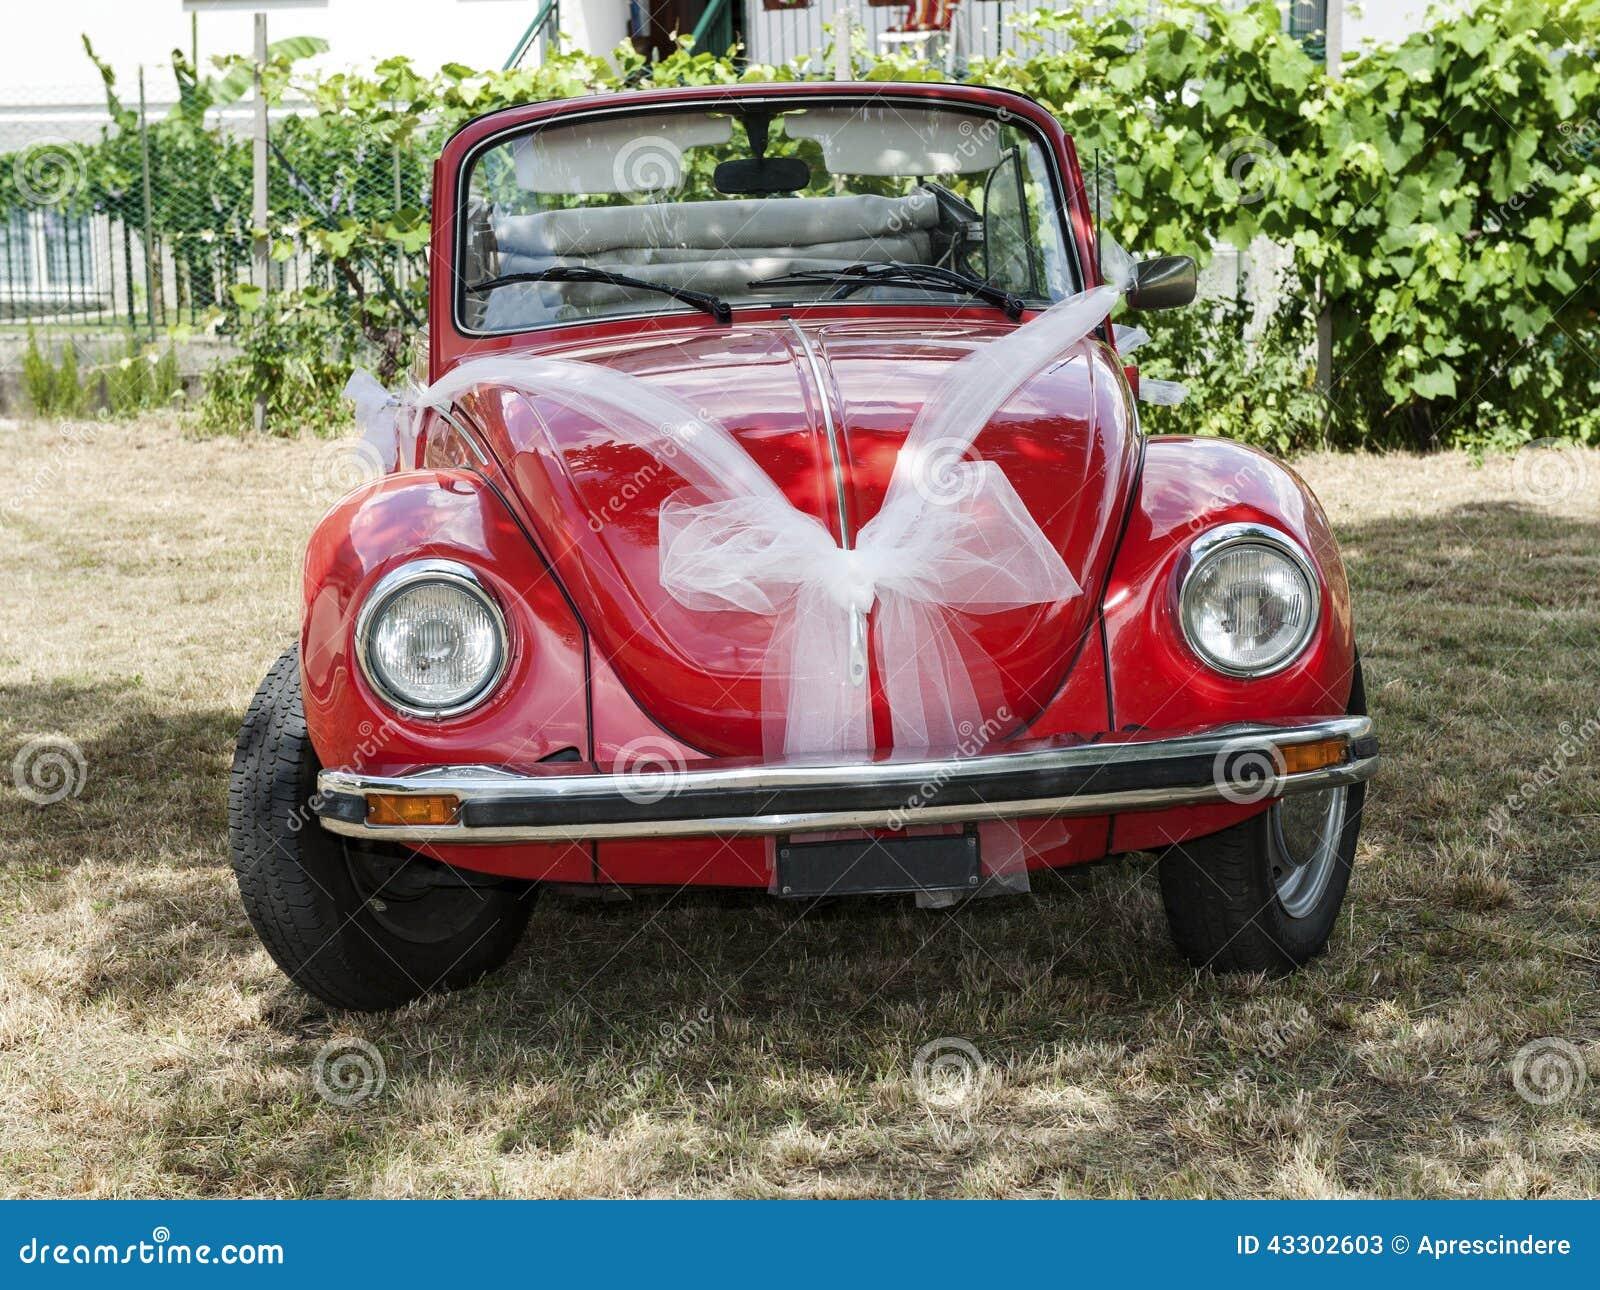 voiture rouge de mariage image stock image du luxe vacances 43302603. Black Bedroom Furniture Sets. Home Design Ideas